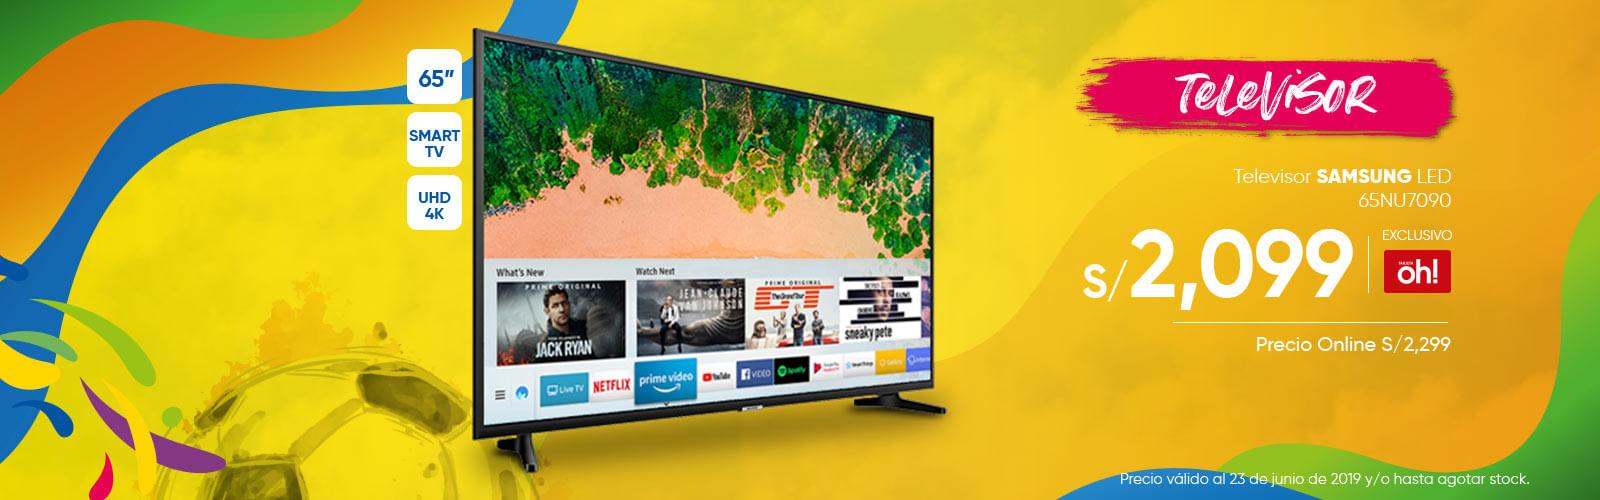 Televisor SAMSUNG 65NU7090